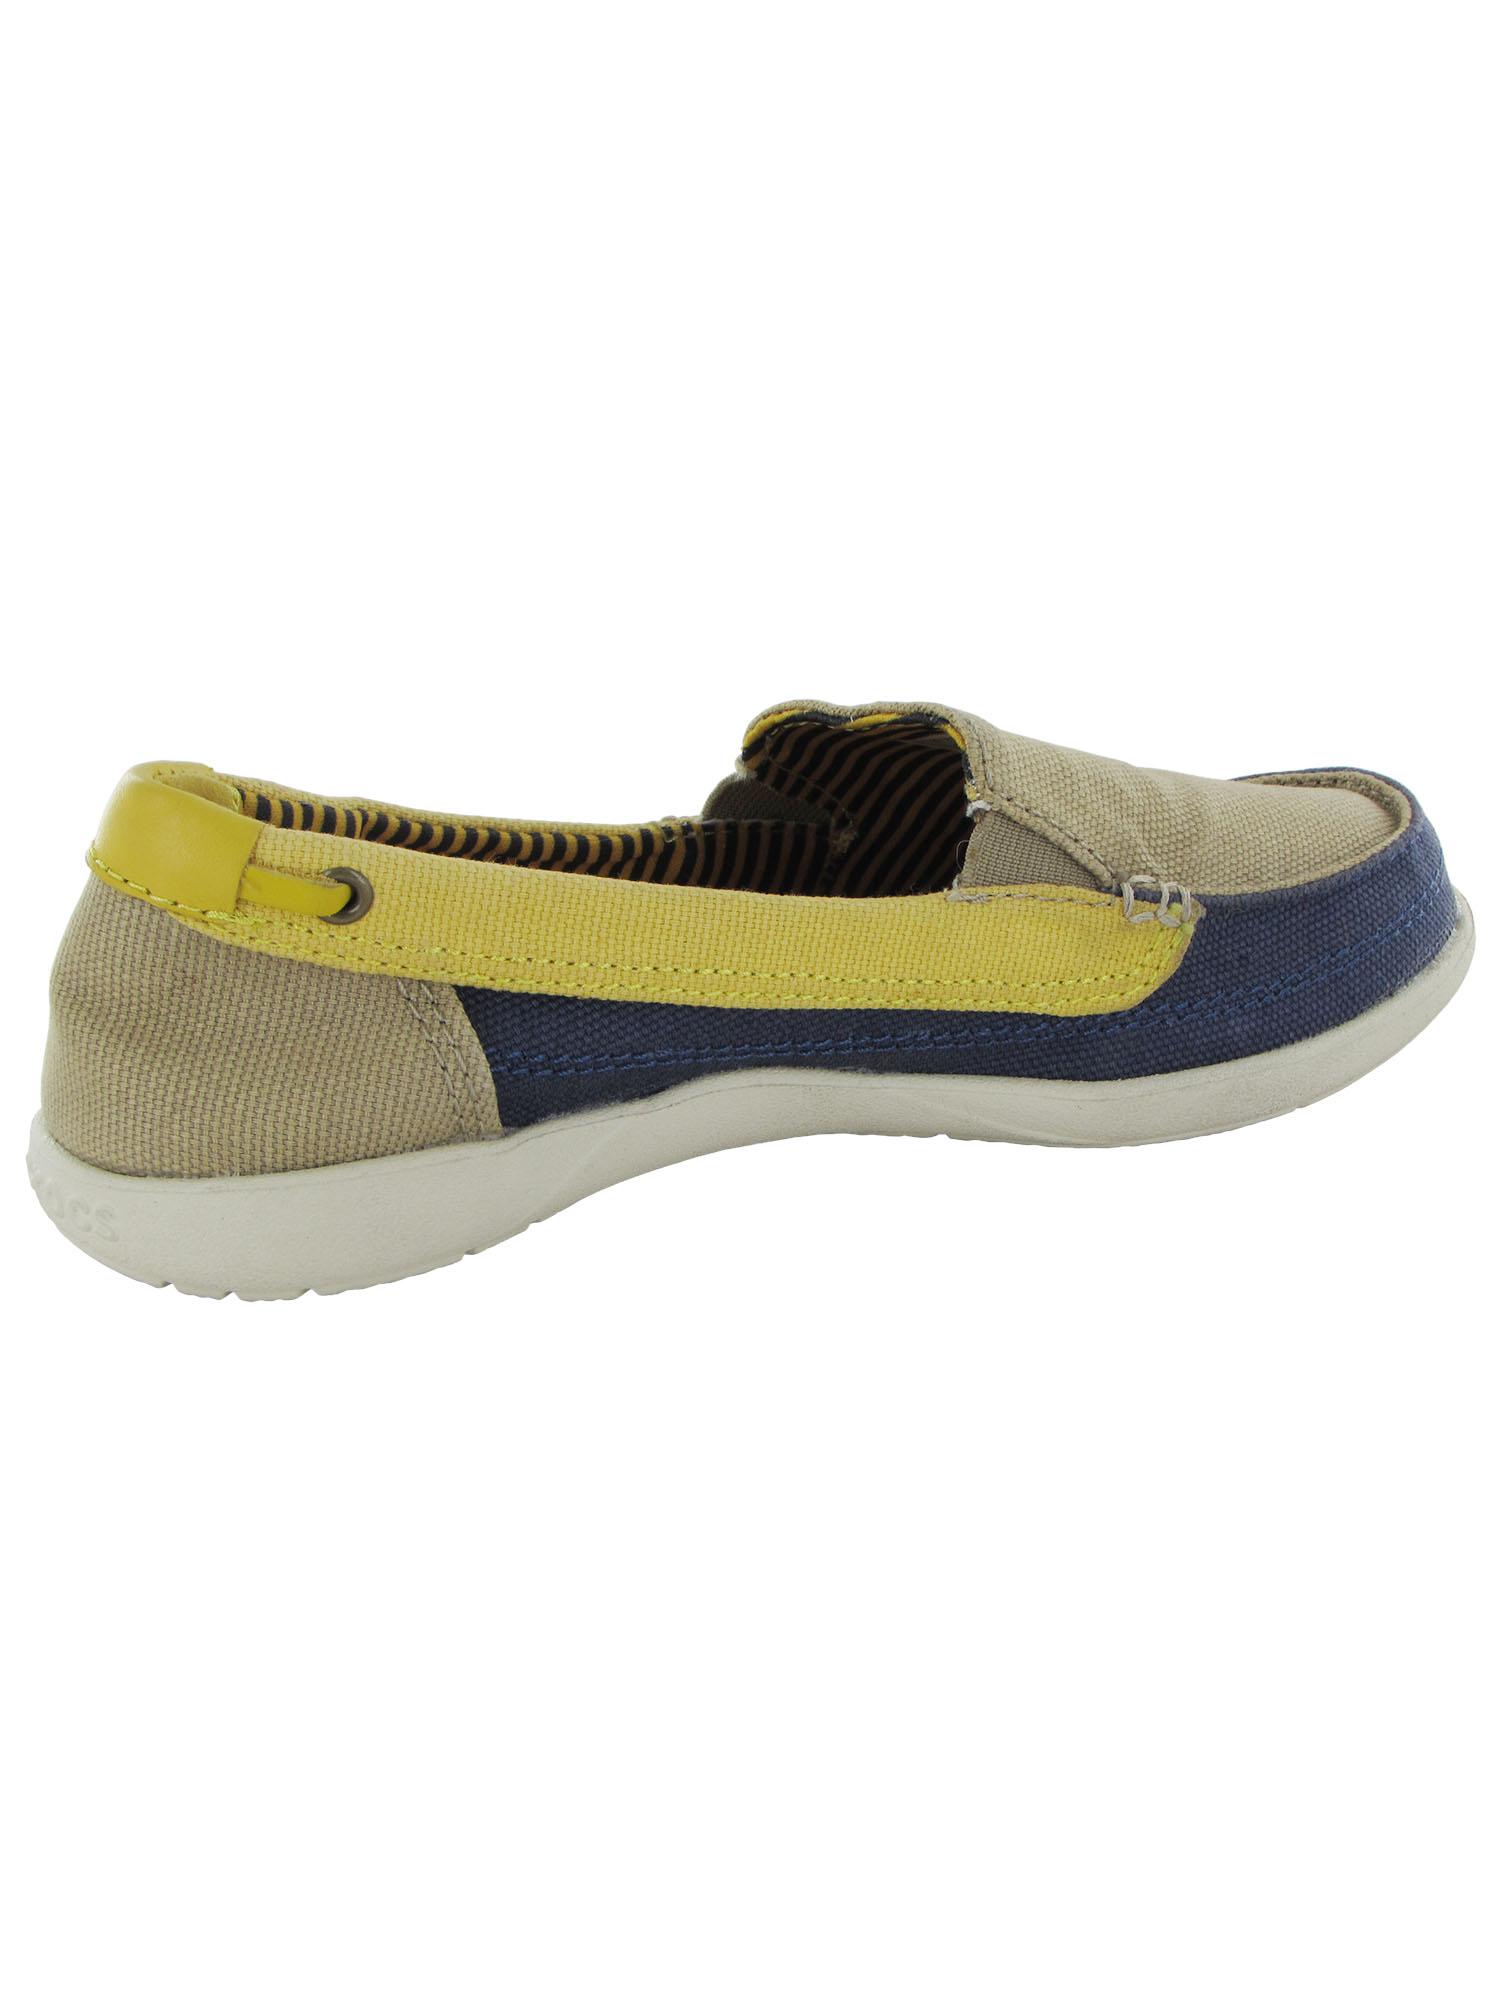 Crocs-Womens-Walu-Canvas-Loafer-Slip-On-Shoe thumbnail 10